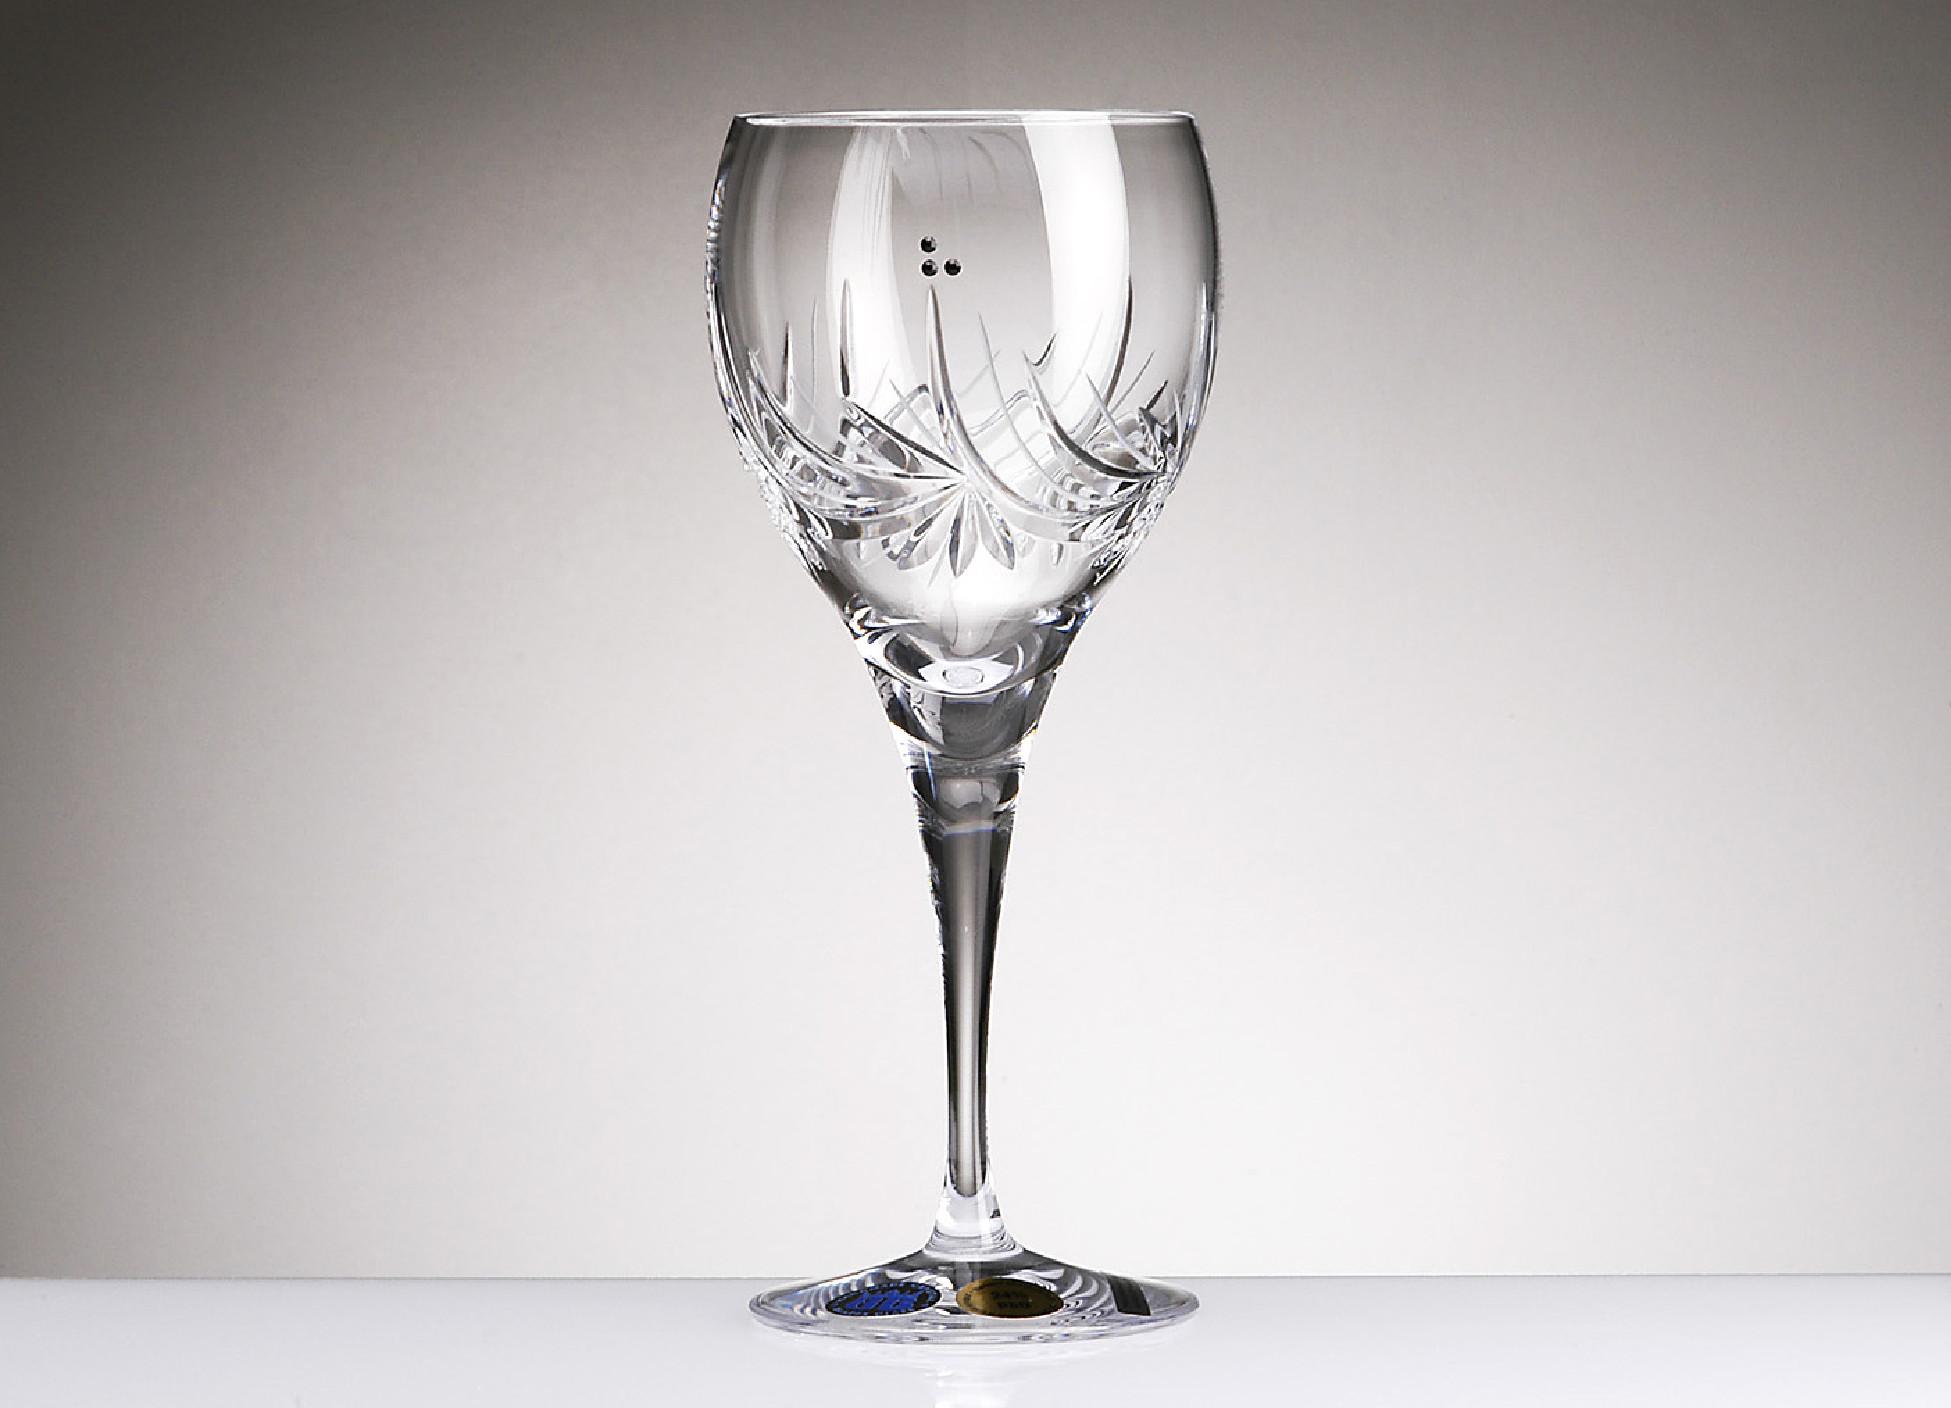 Verres - Prix d un verre en cristal ...